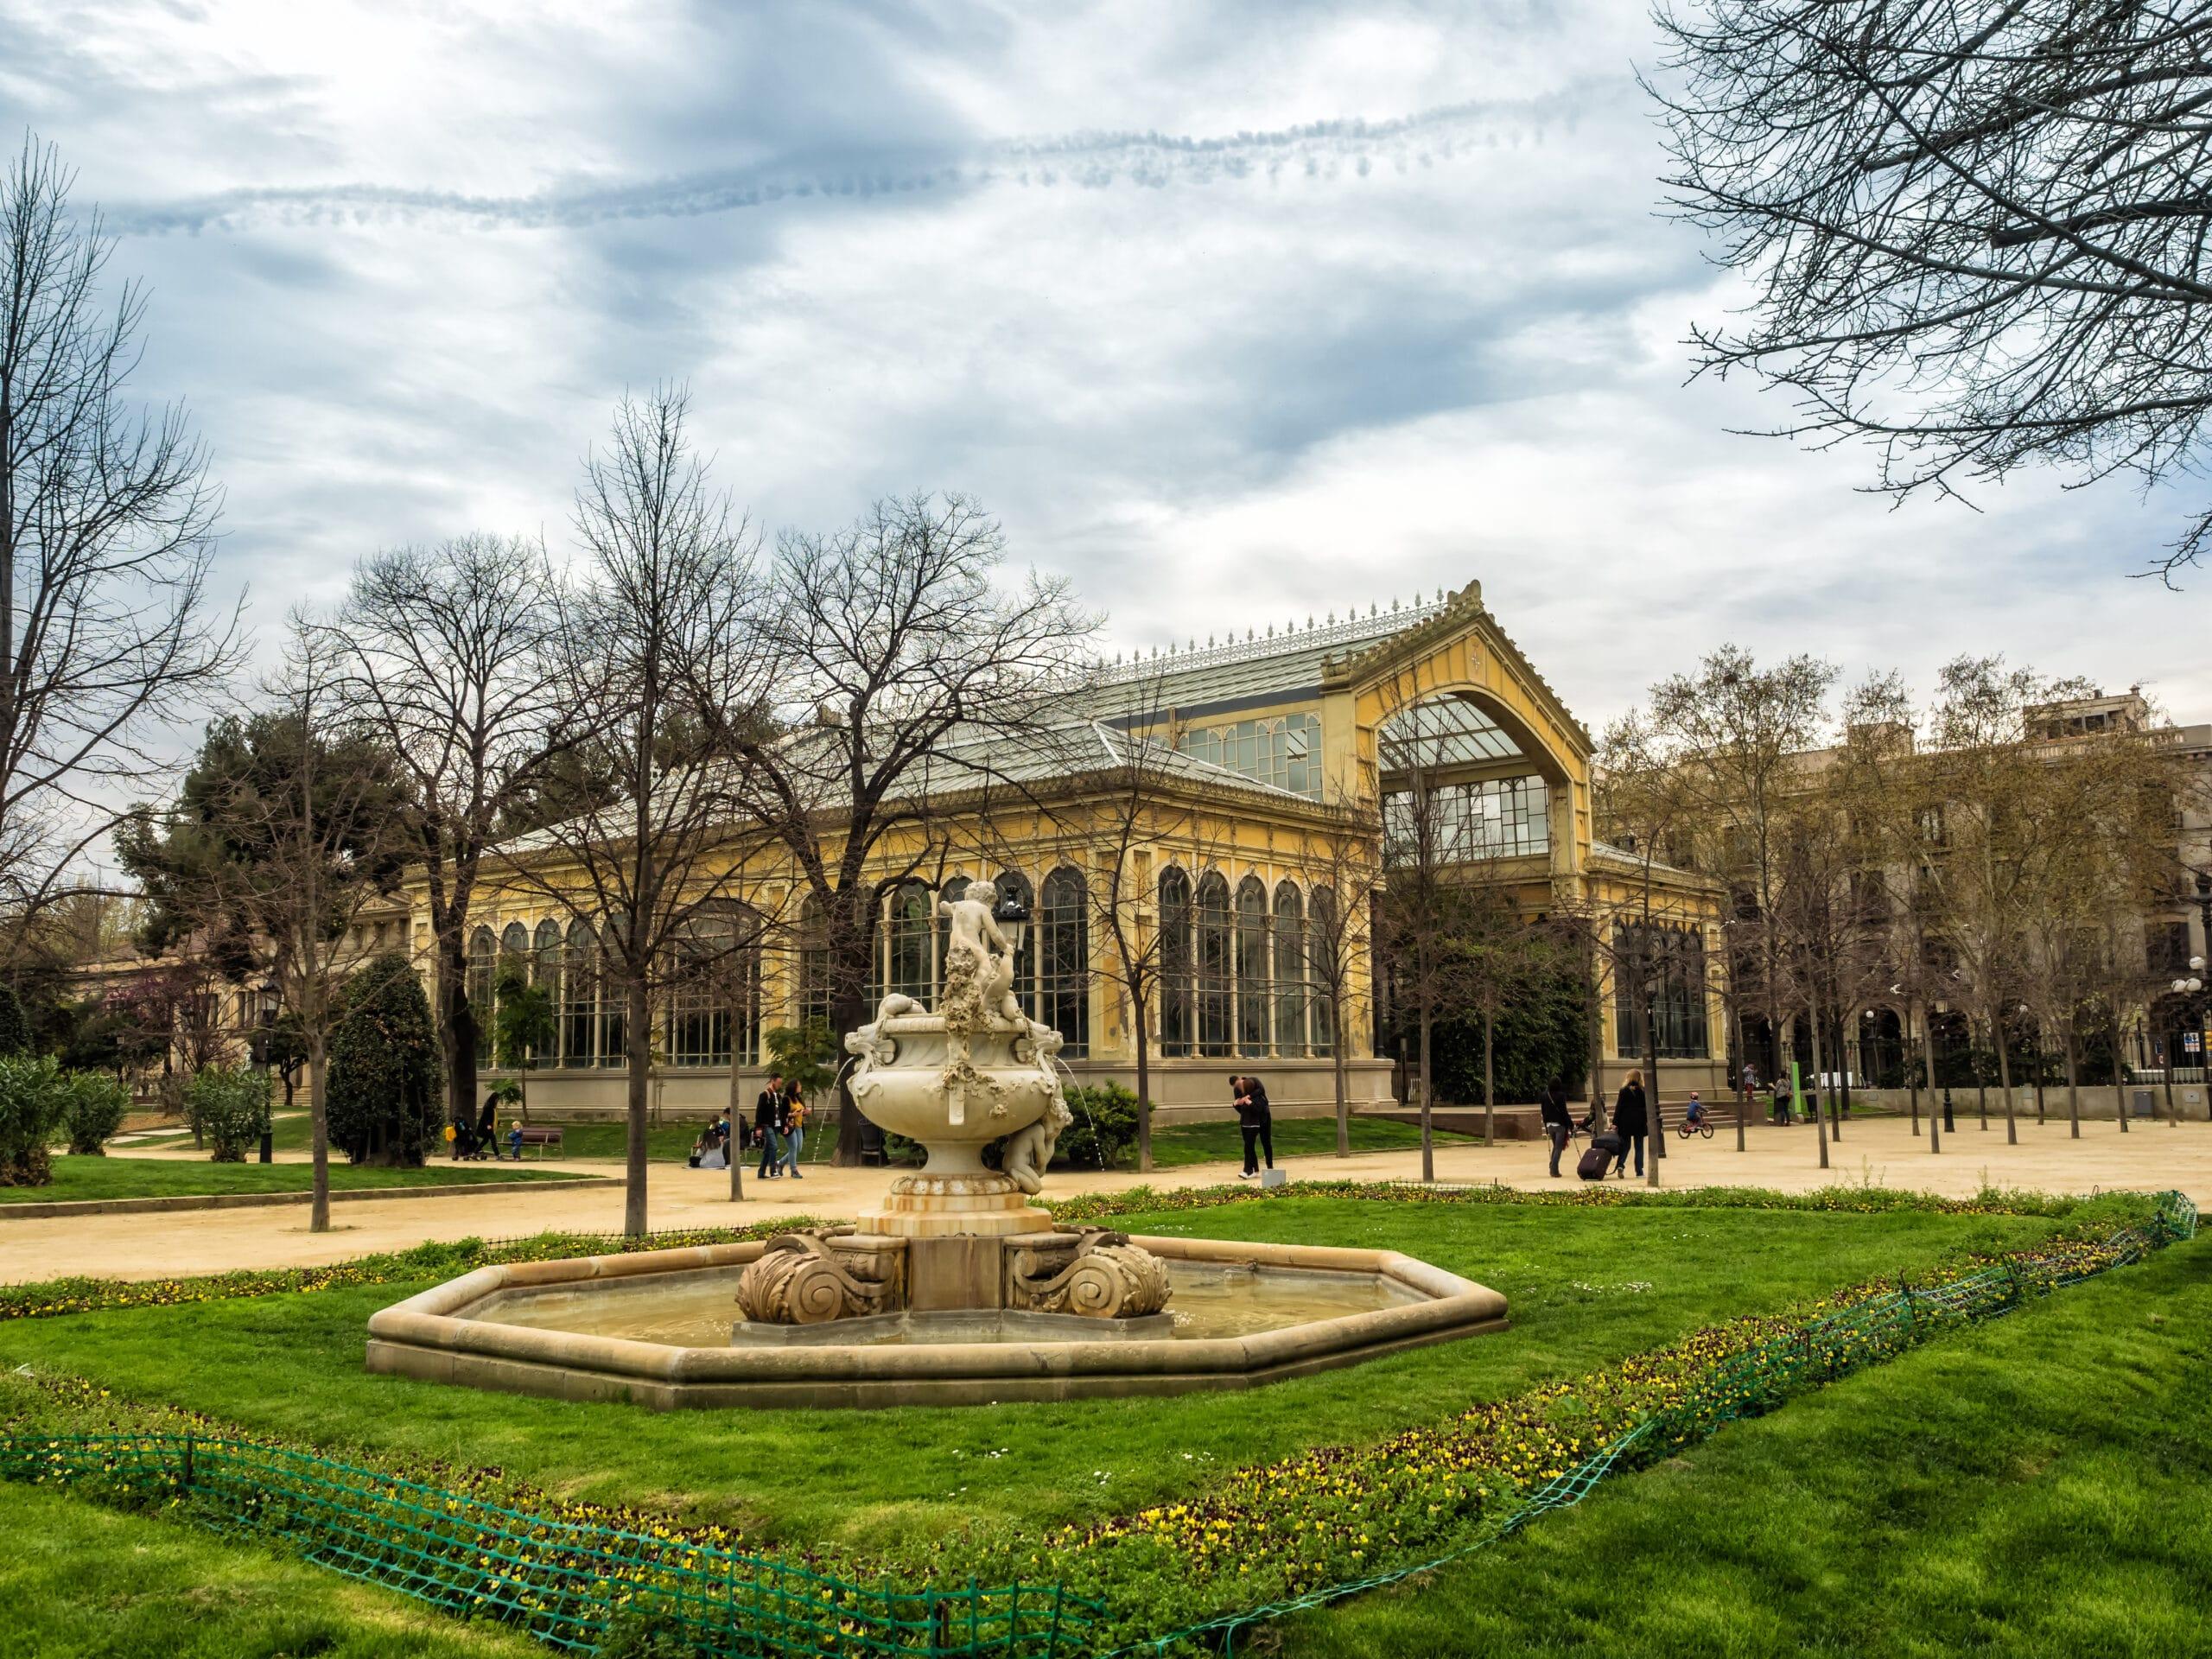 Umbracle, en el Parc de la Ciutadella